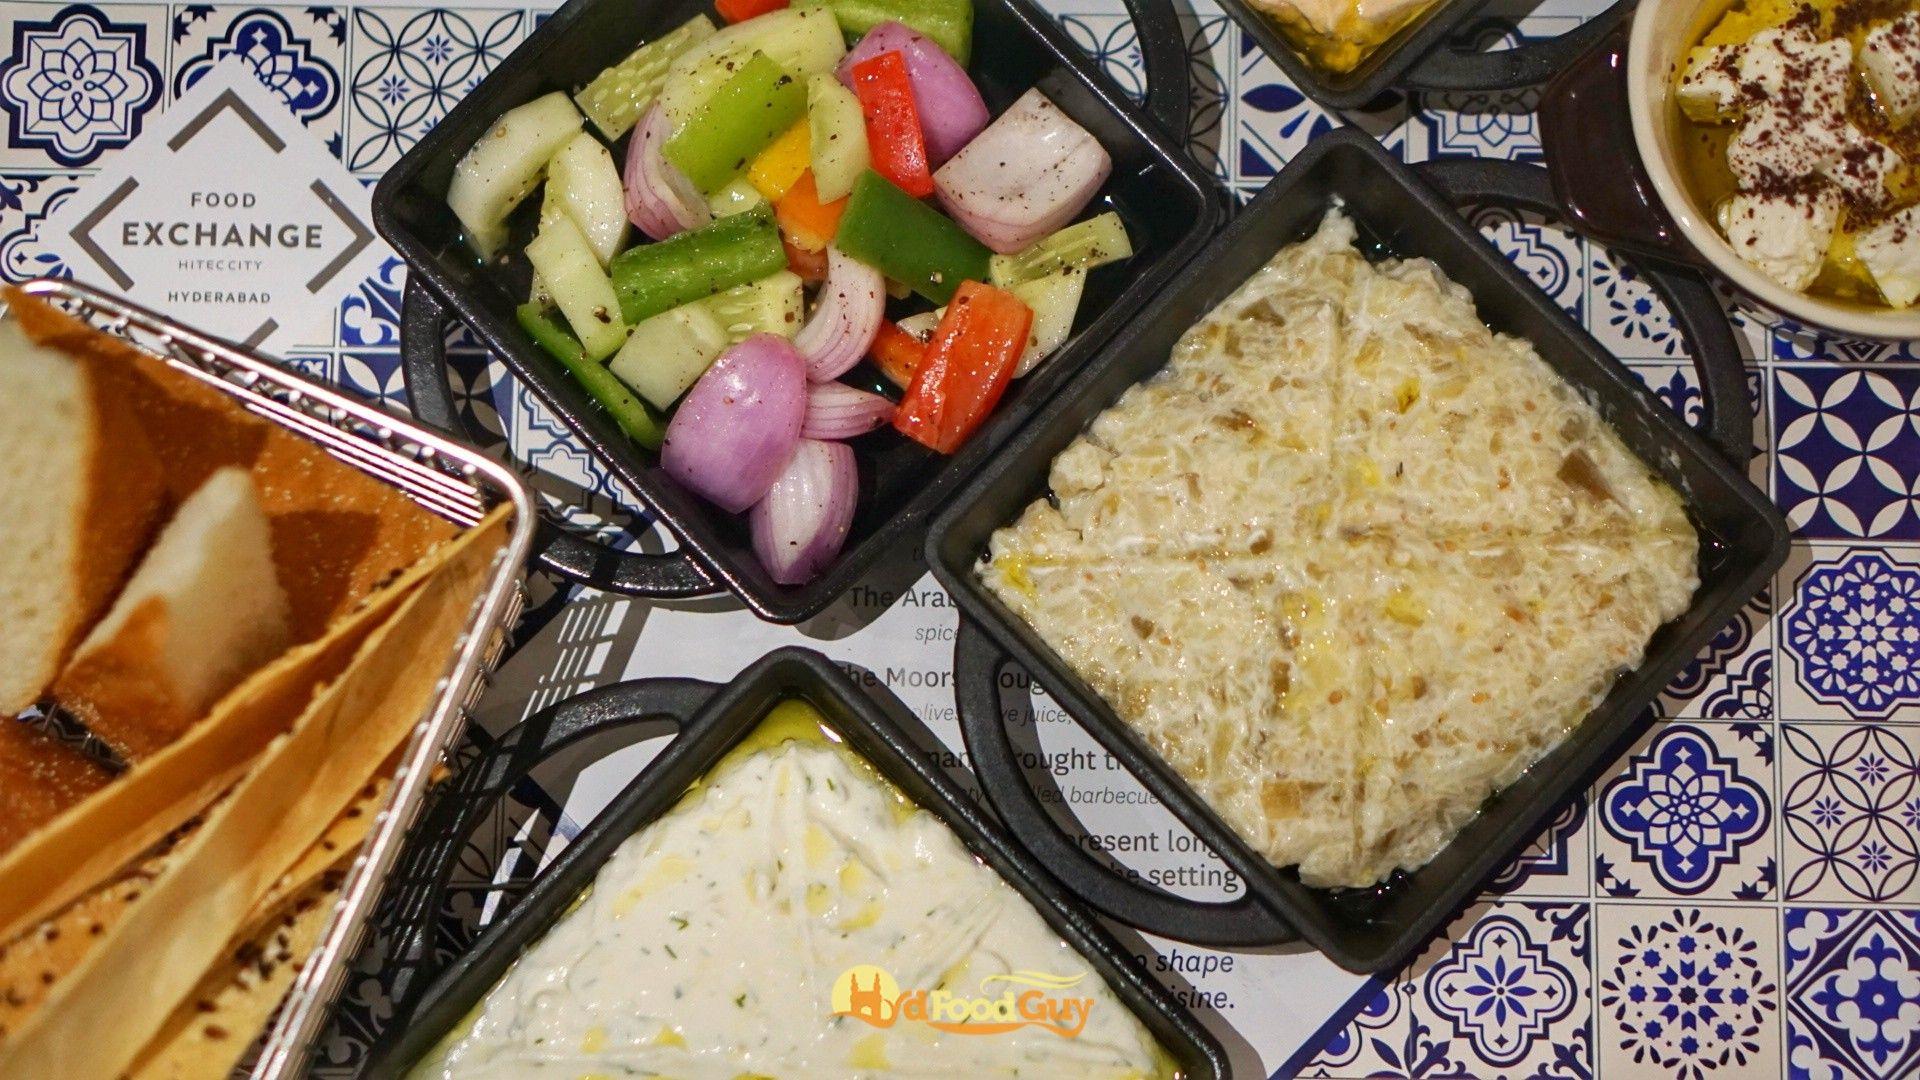 Morocco Food Festival at Novotel Hyderabad